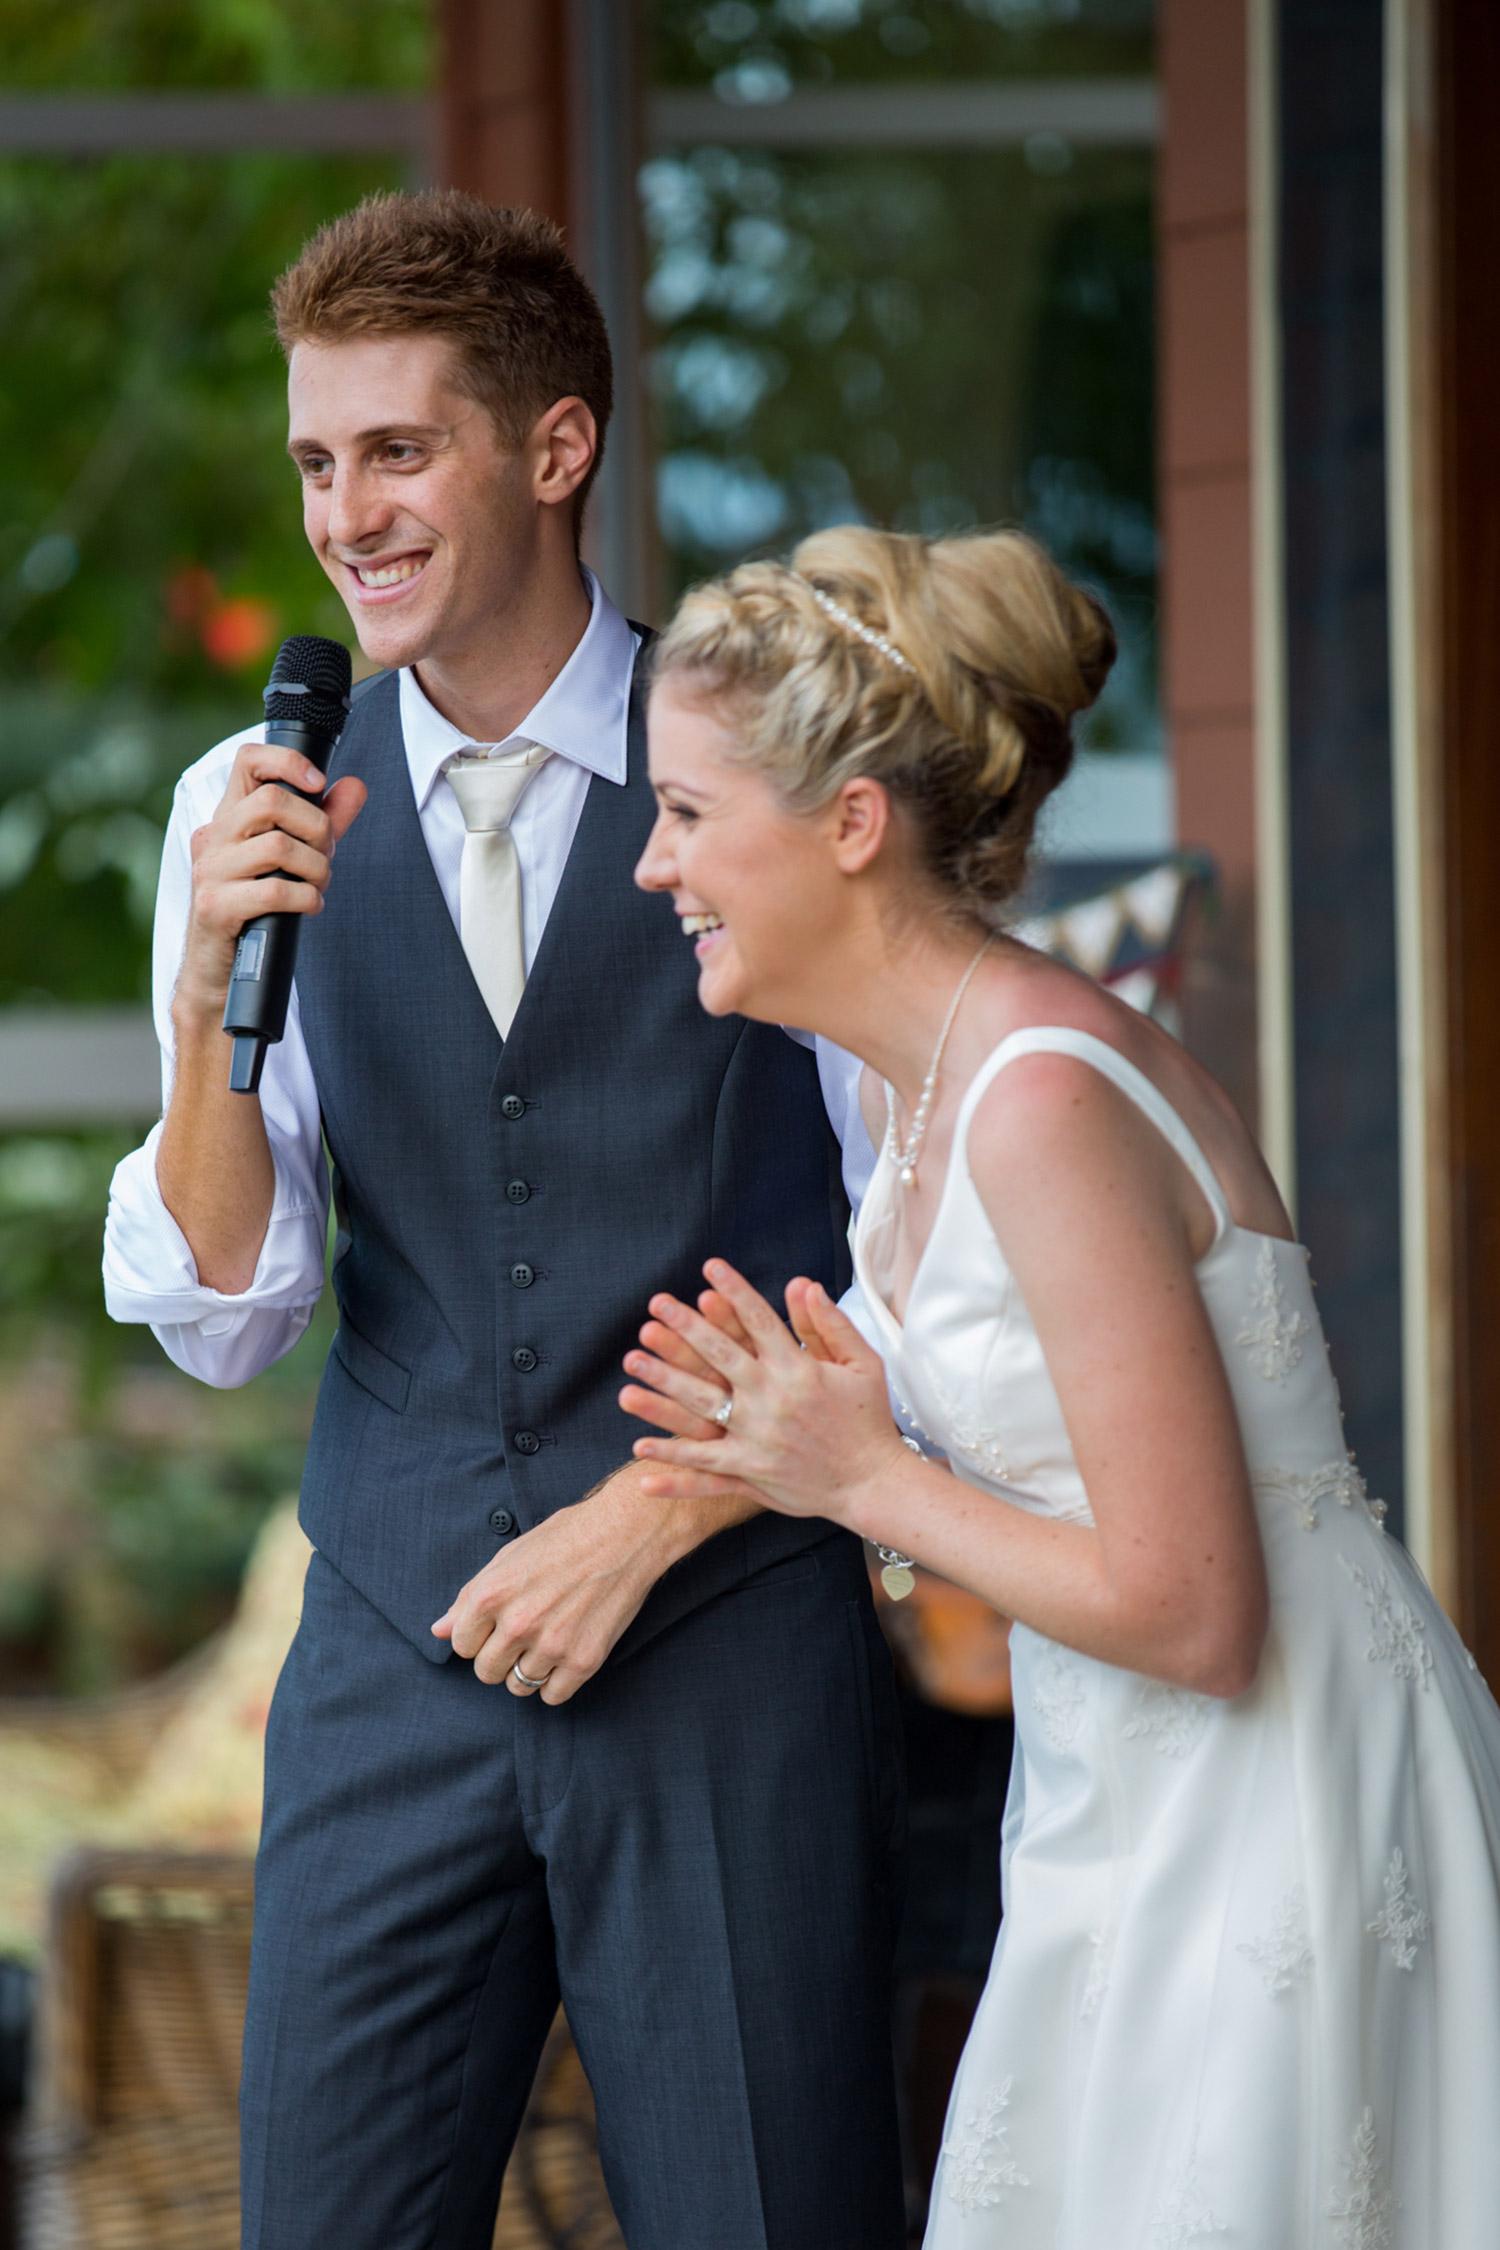 81-sunshine-coast-wedding-photography-all-the-love-in-the-world-noosa-mooloolaba-glasshouse-brisbane-katie-ryan5565.jpg